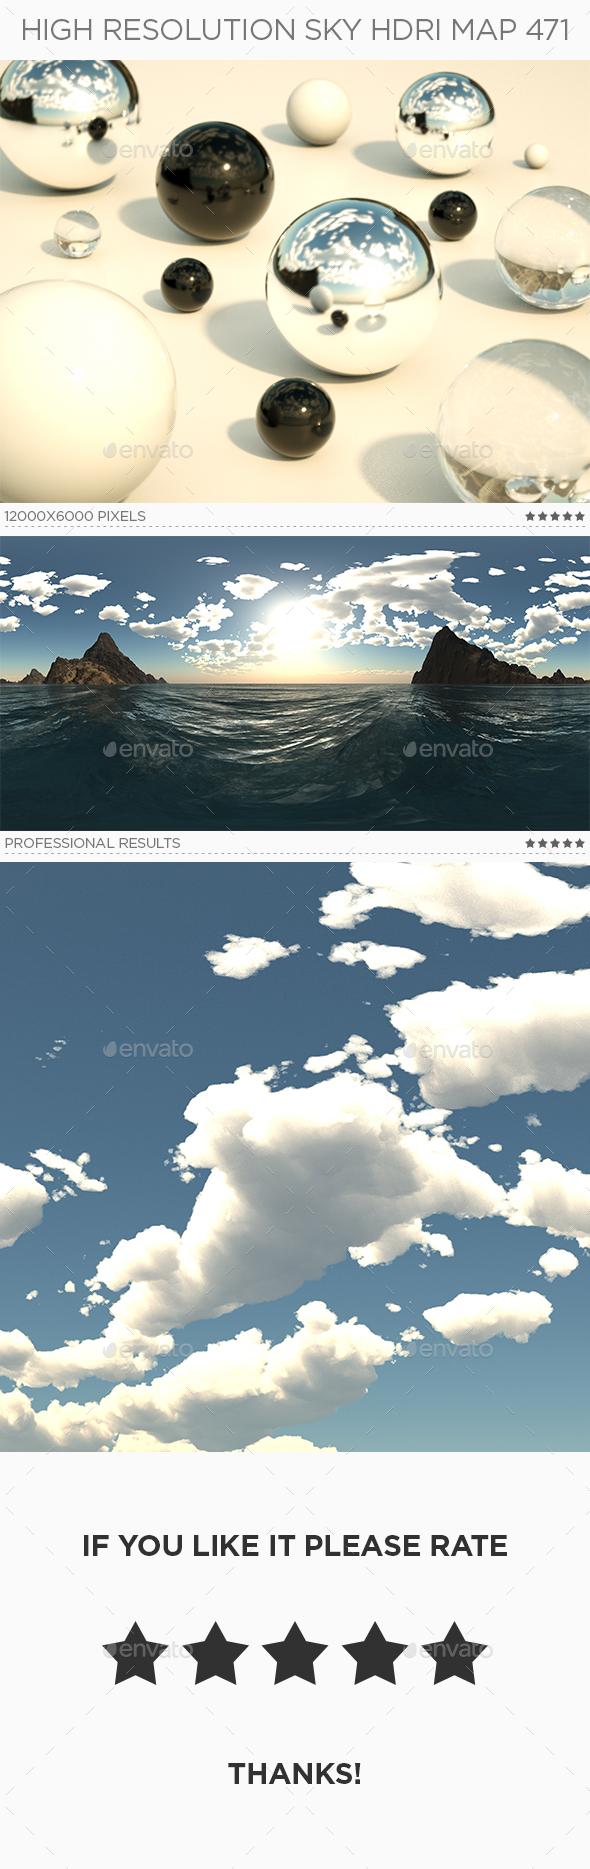 High Resolution Sky HDRi Map 471